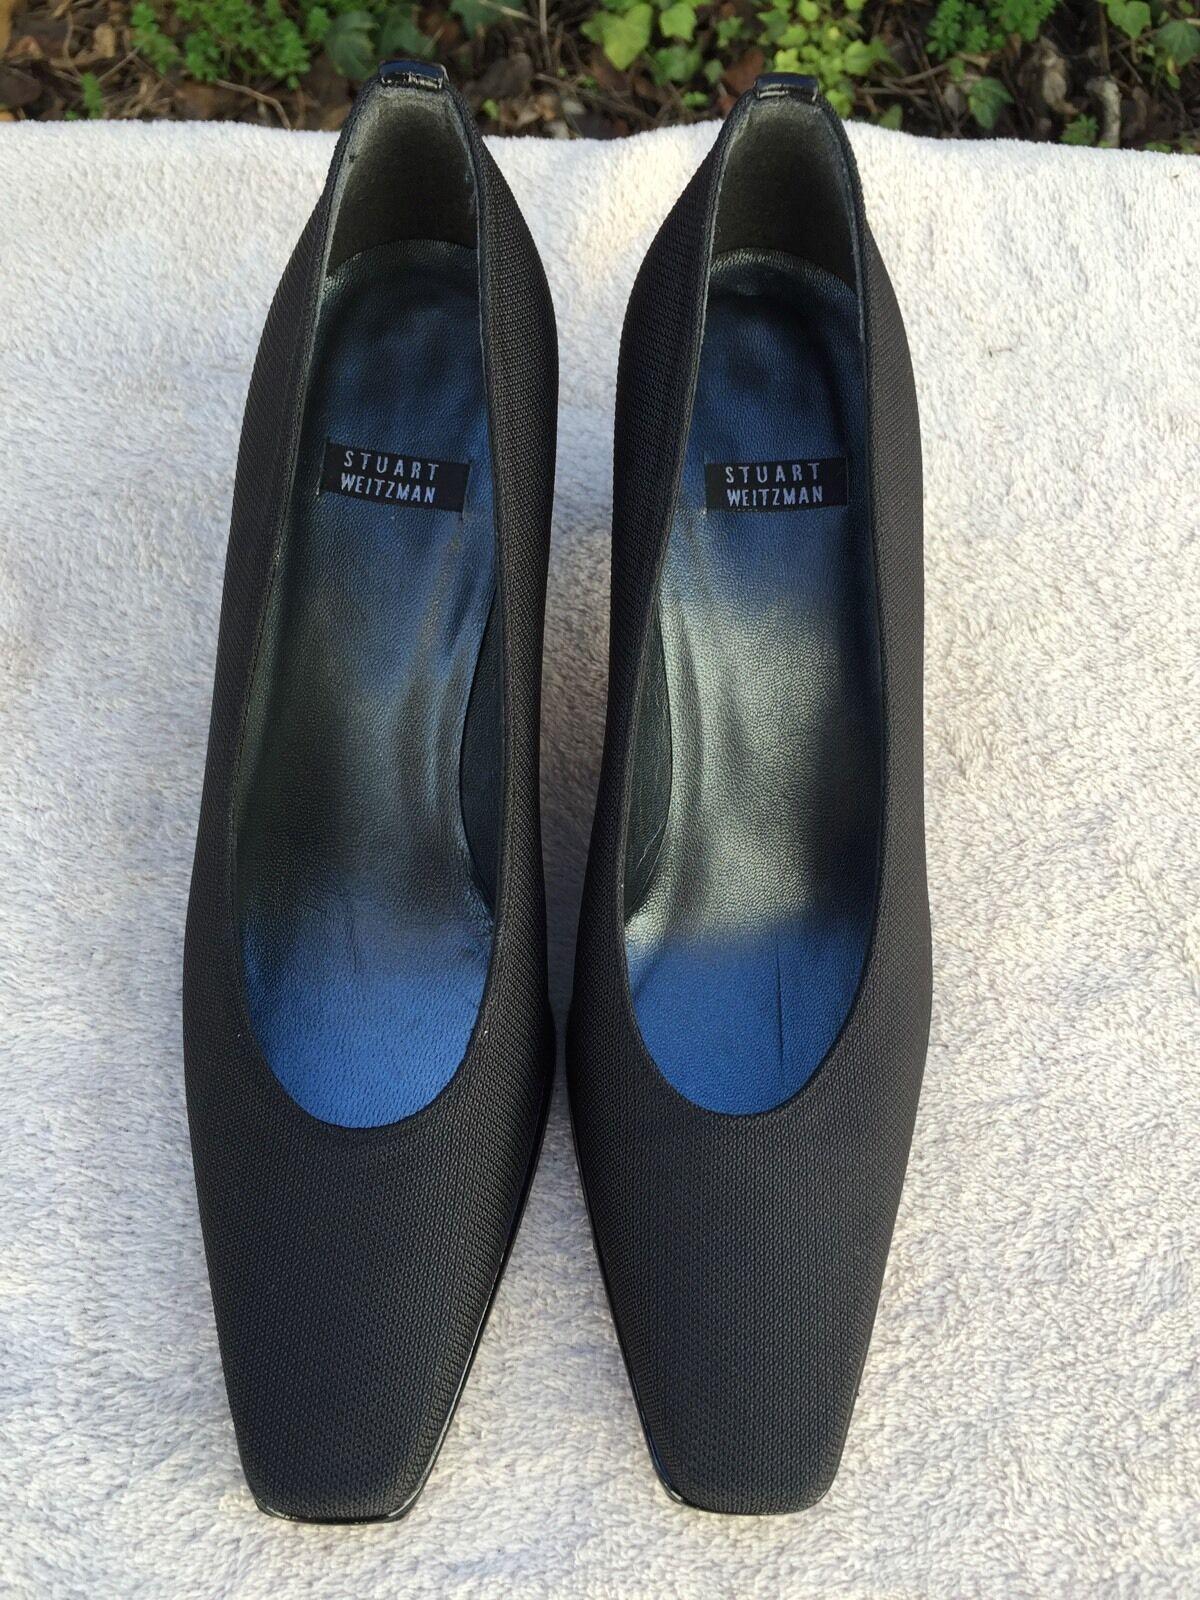 economico NEW Stuart Weitzman Donna  Pumps Heel nero nero nero scarpe Us Sz 7.5 Made in Spain  qualità garantita